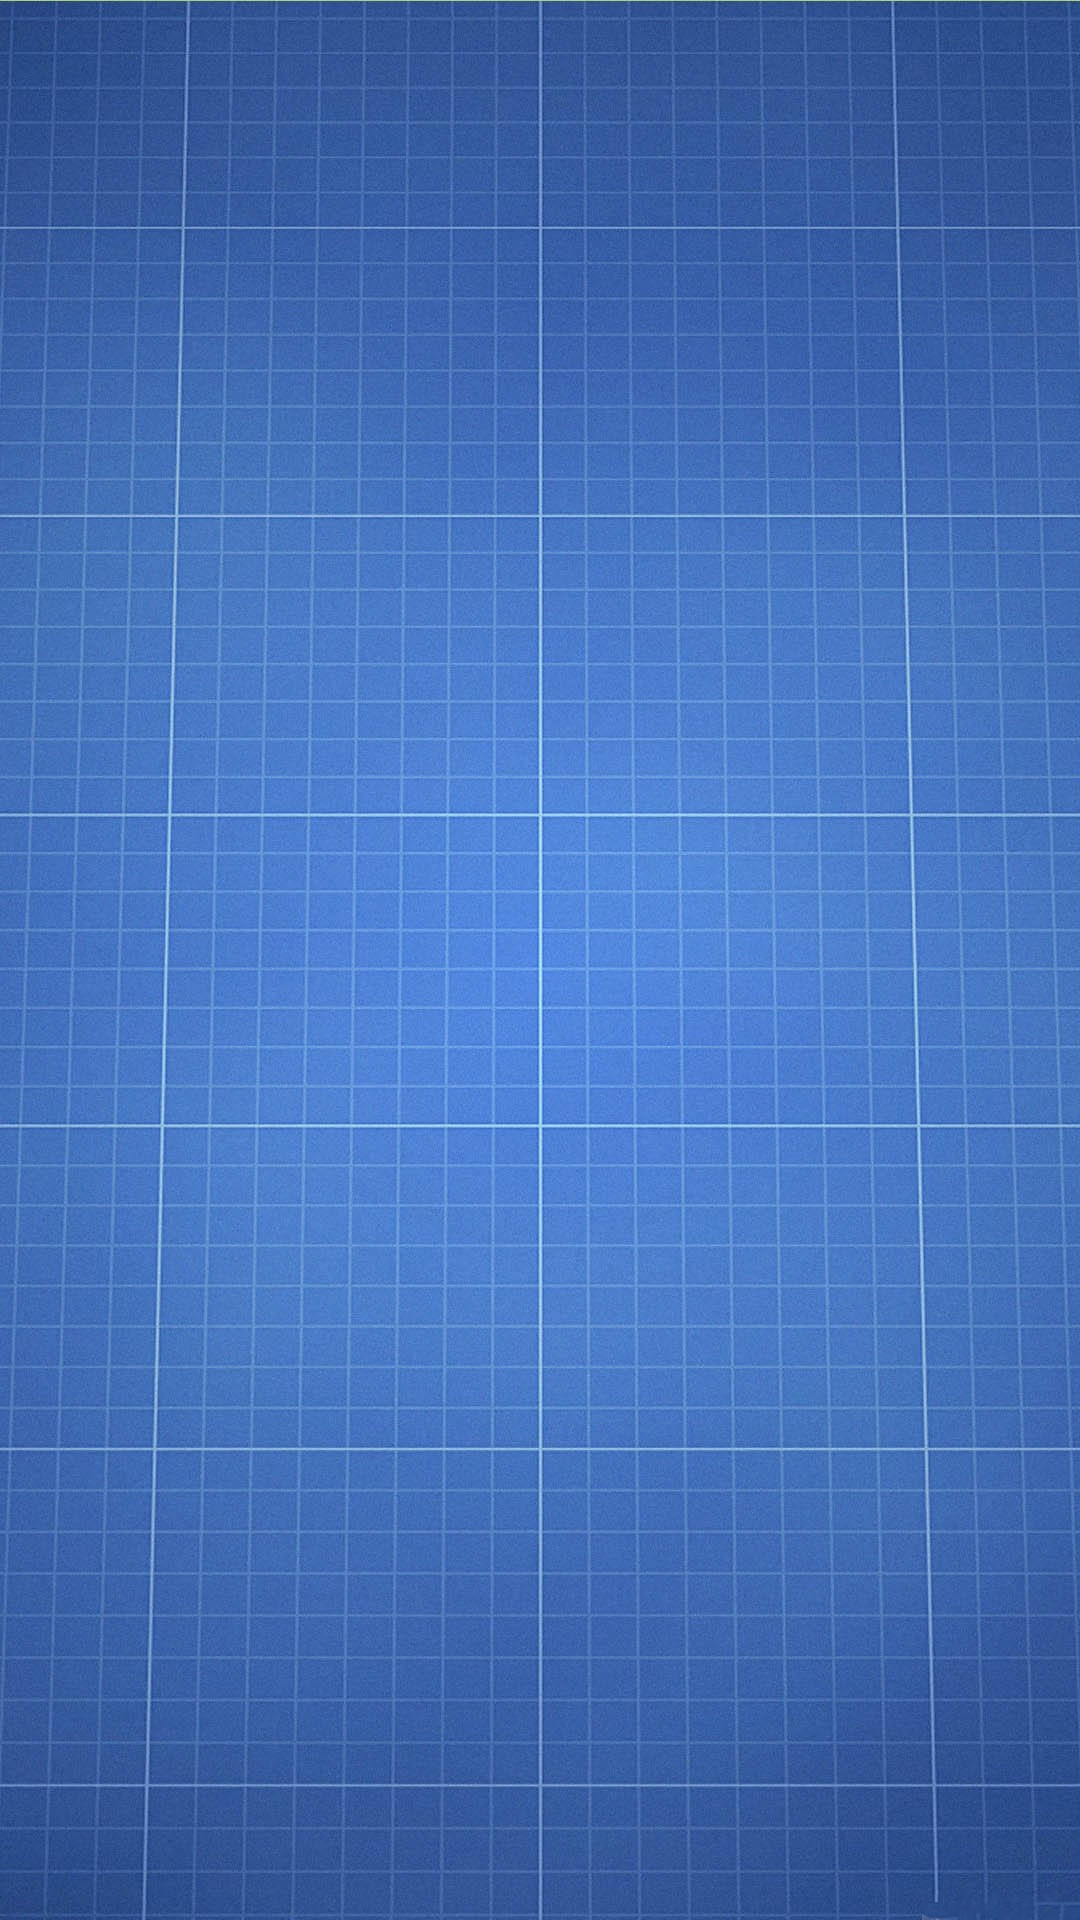 Cool ipod 5 wallpapers 61 images 1080x1920 gods eye nebula messier iphone 8 wallpaper malvernweather Gallery